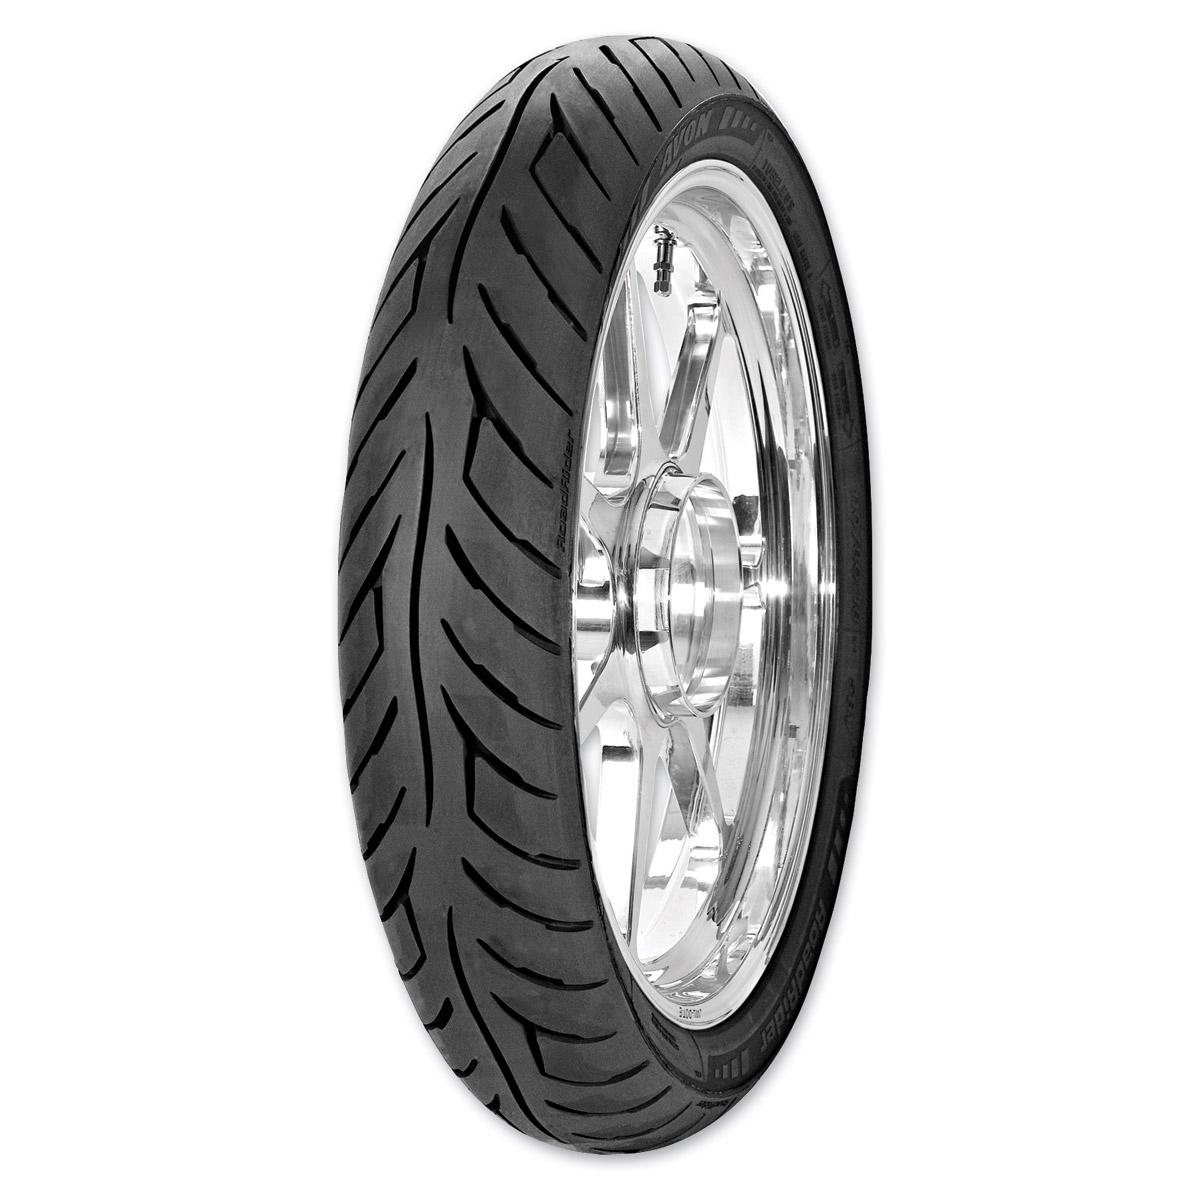 Avon AM26 Roadrider 100/90-19 Front/Rear Tire